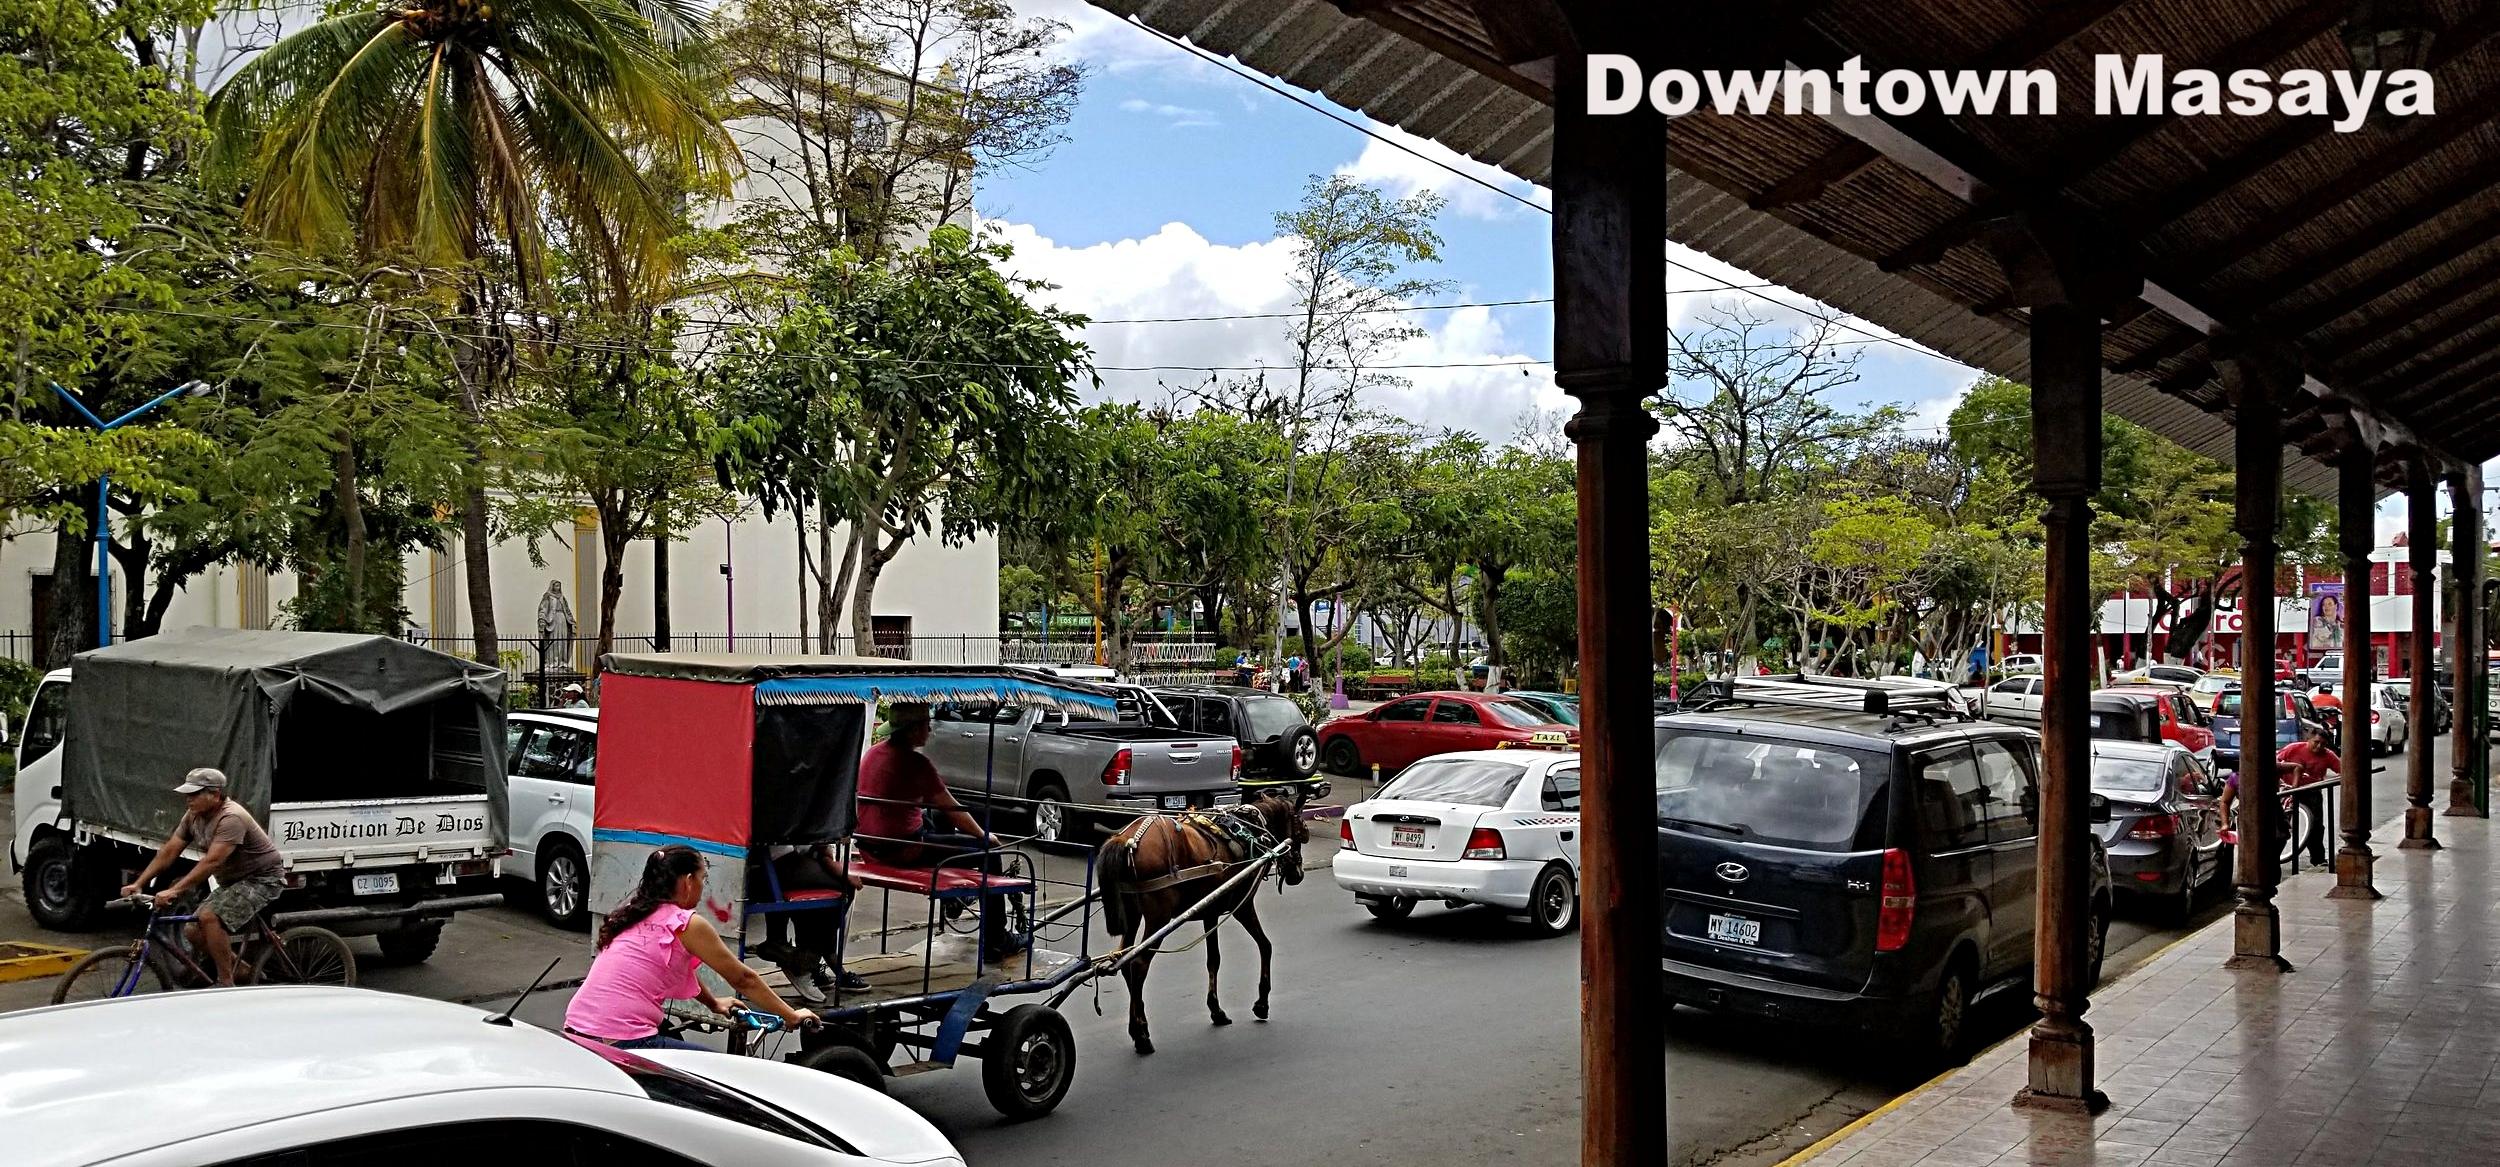 Downtown Masaya.jpg